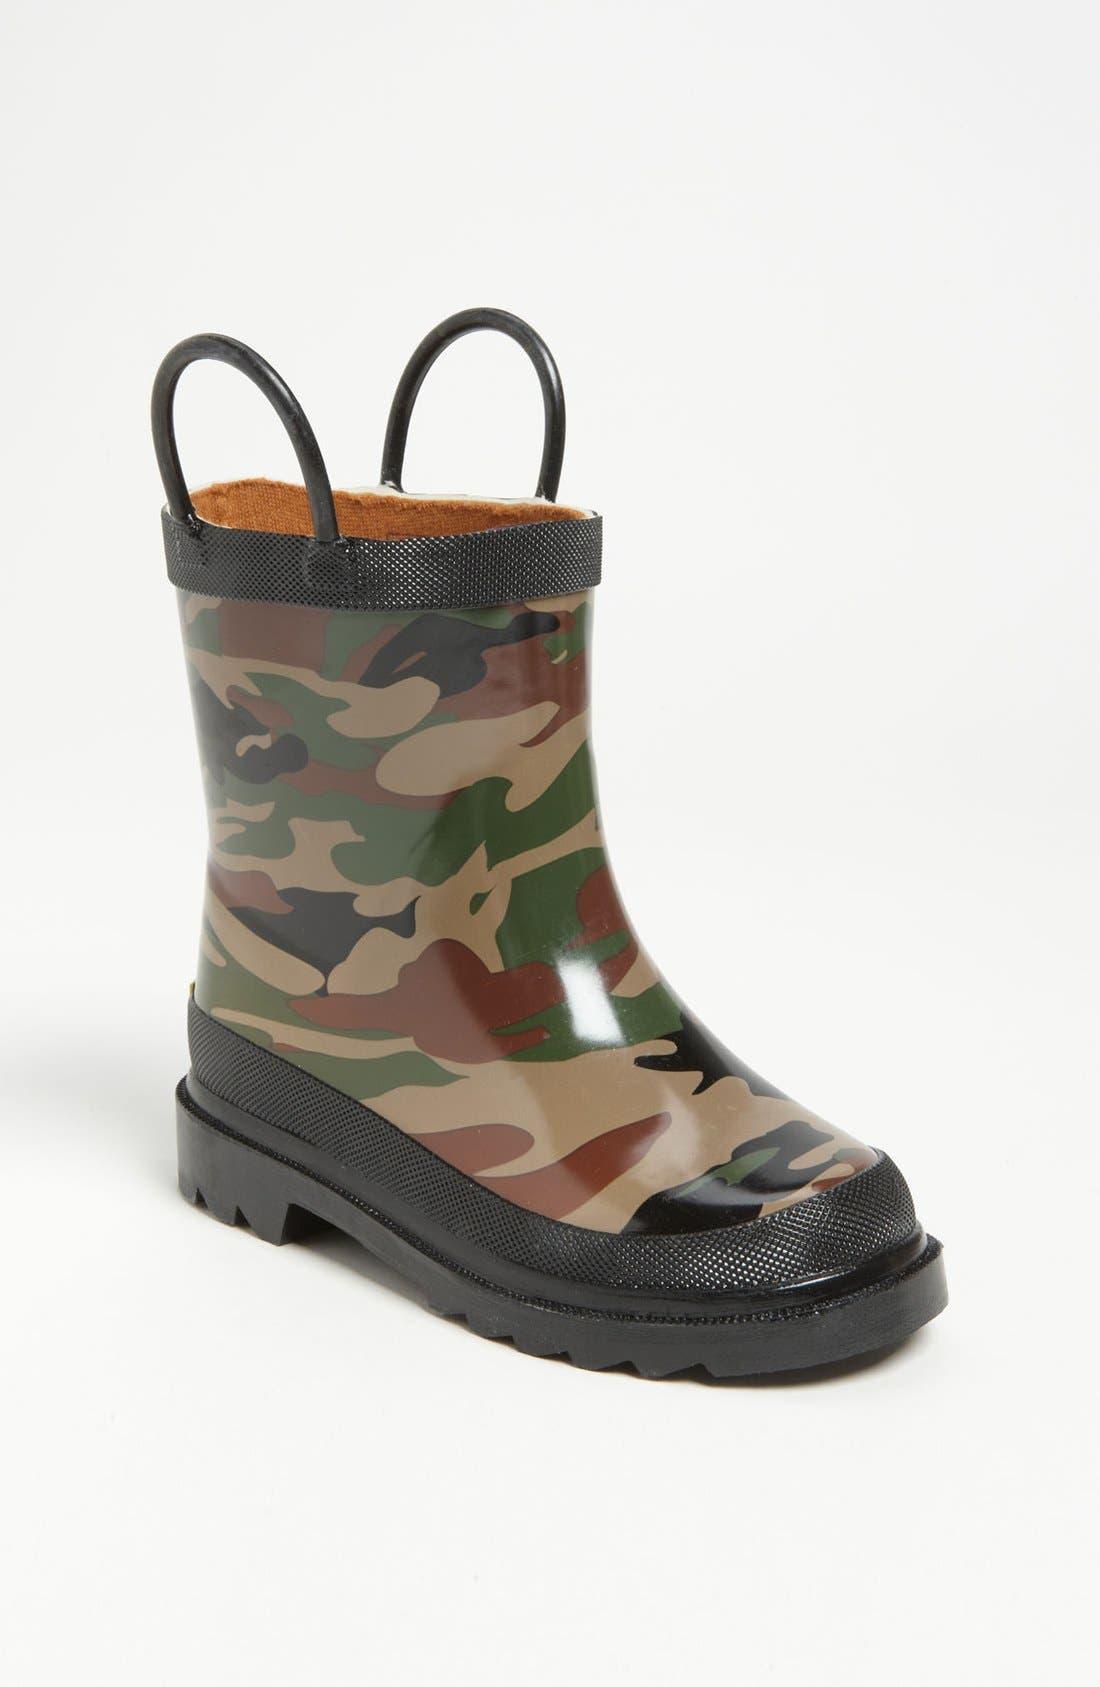 Camo Waterproof Rain Boot,                             Main thumbnail 1, color,                             CAMO